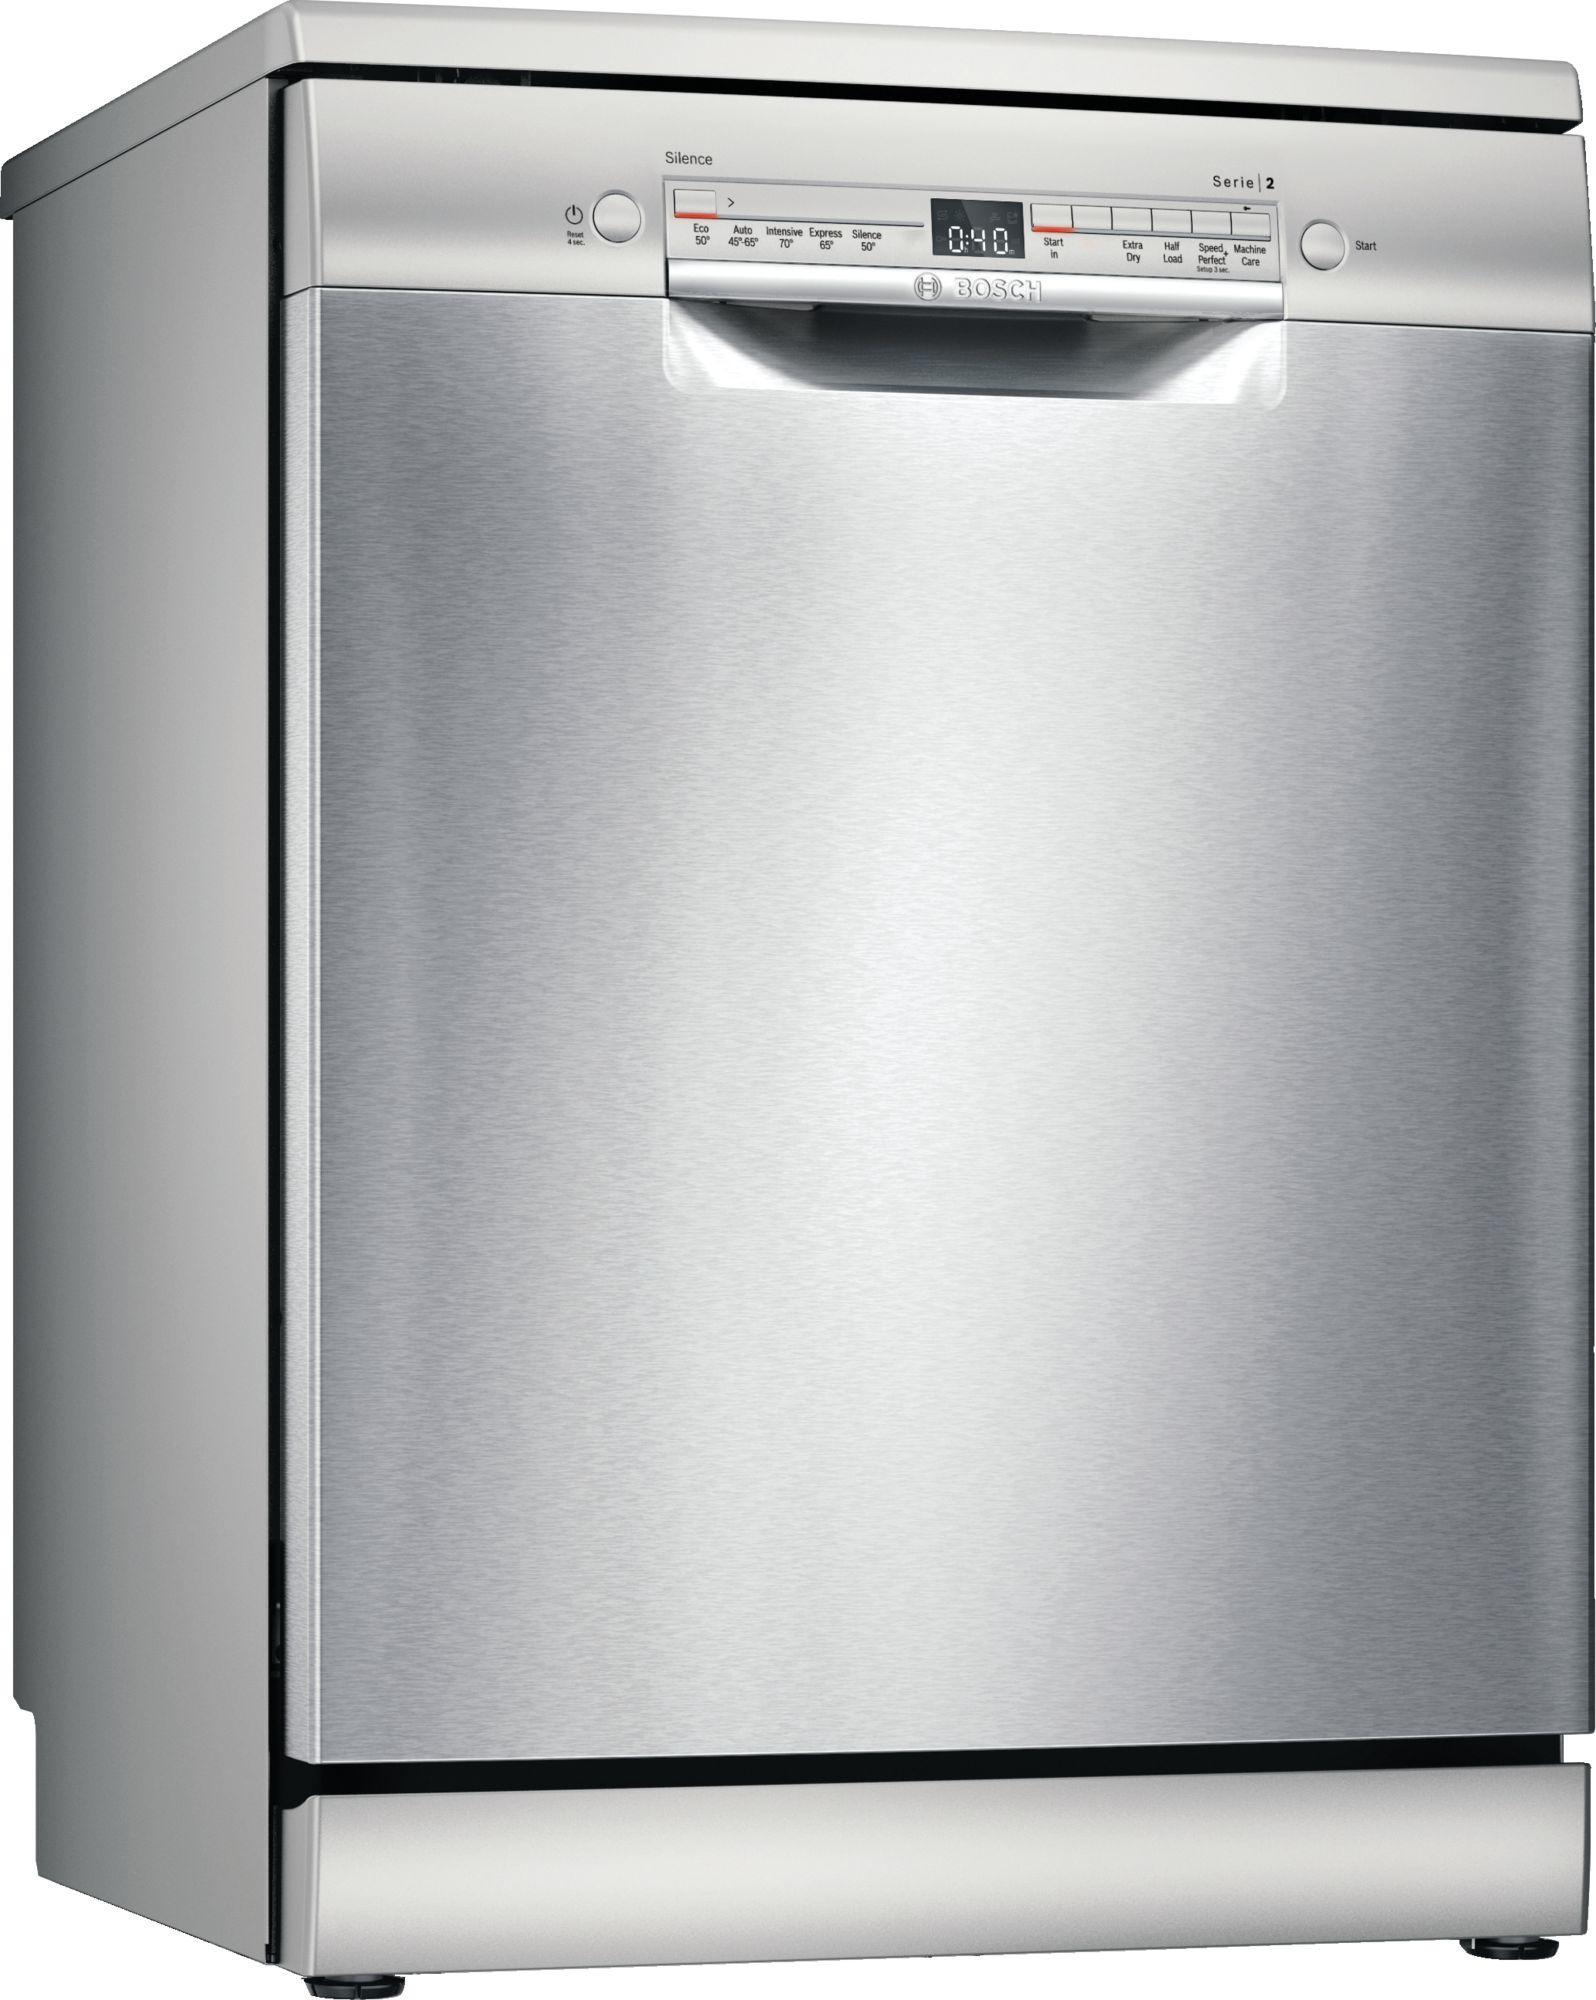 Image of Serie 2 SGS2HKI66G 60cm Standard Dishwasher | Silver Innox